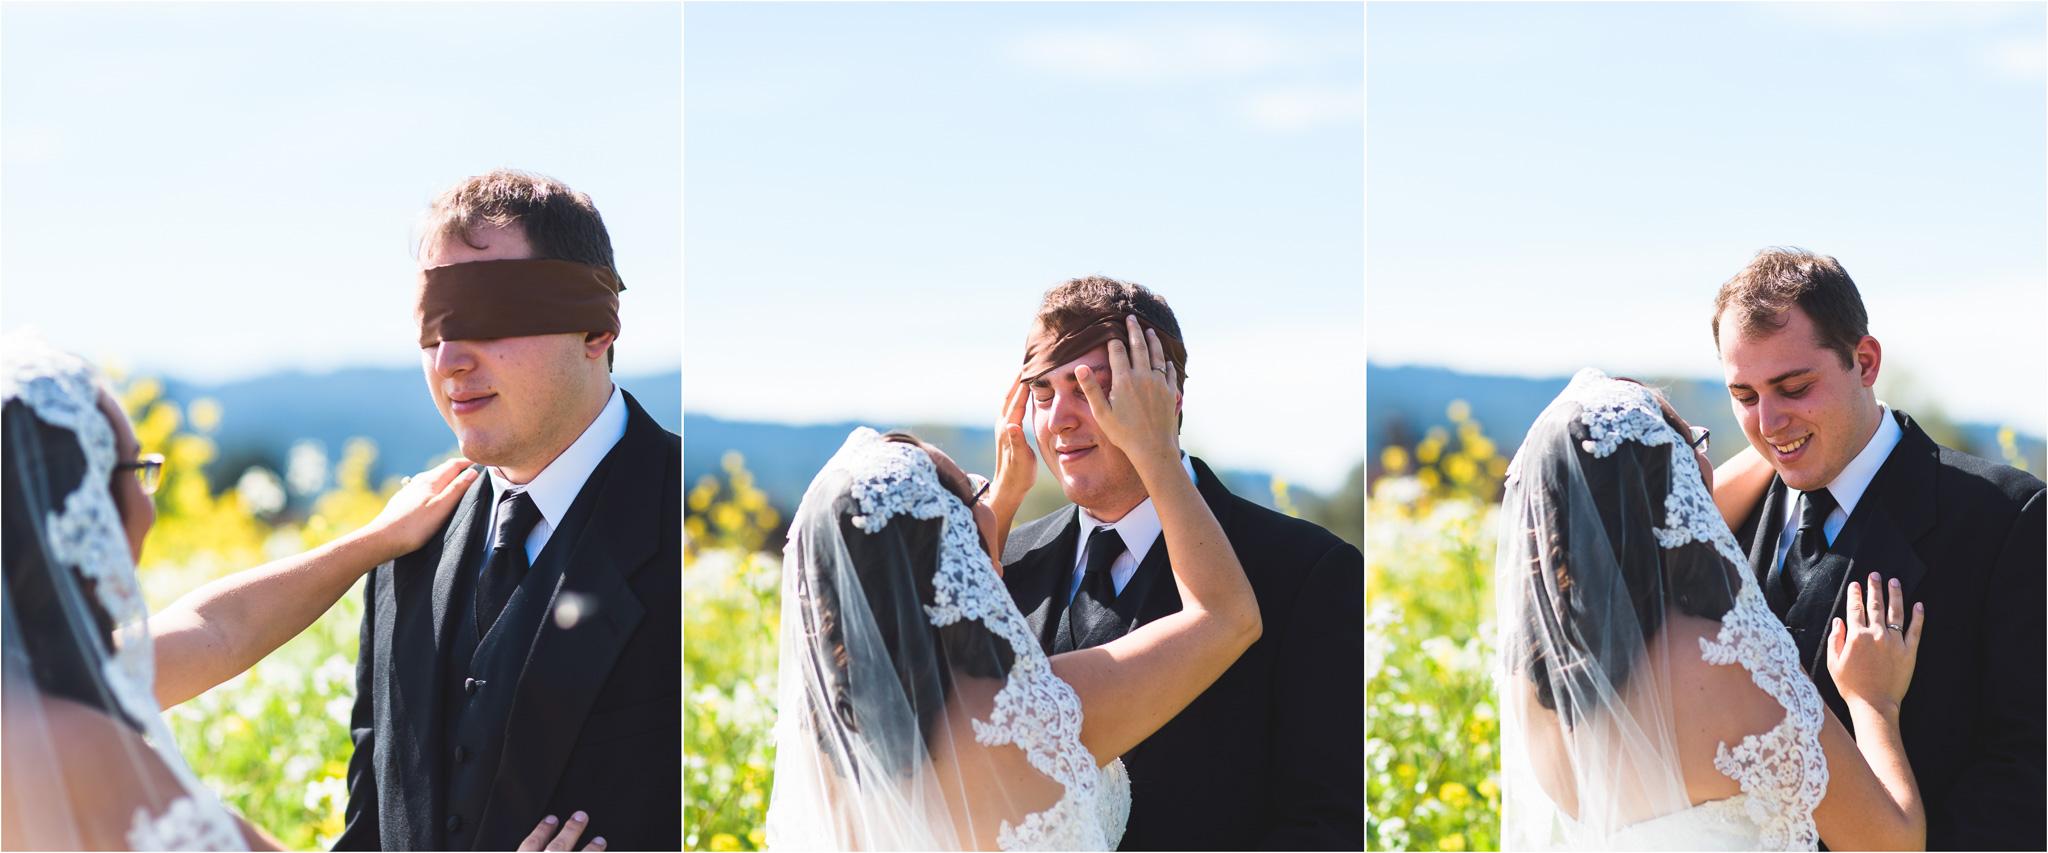 Sonoma_Backyard_Wedding-Chuck_Caroline-017.jpg